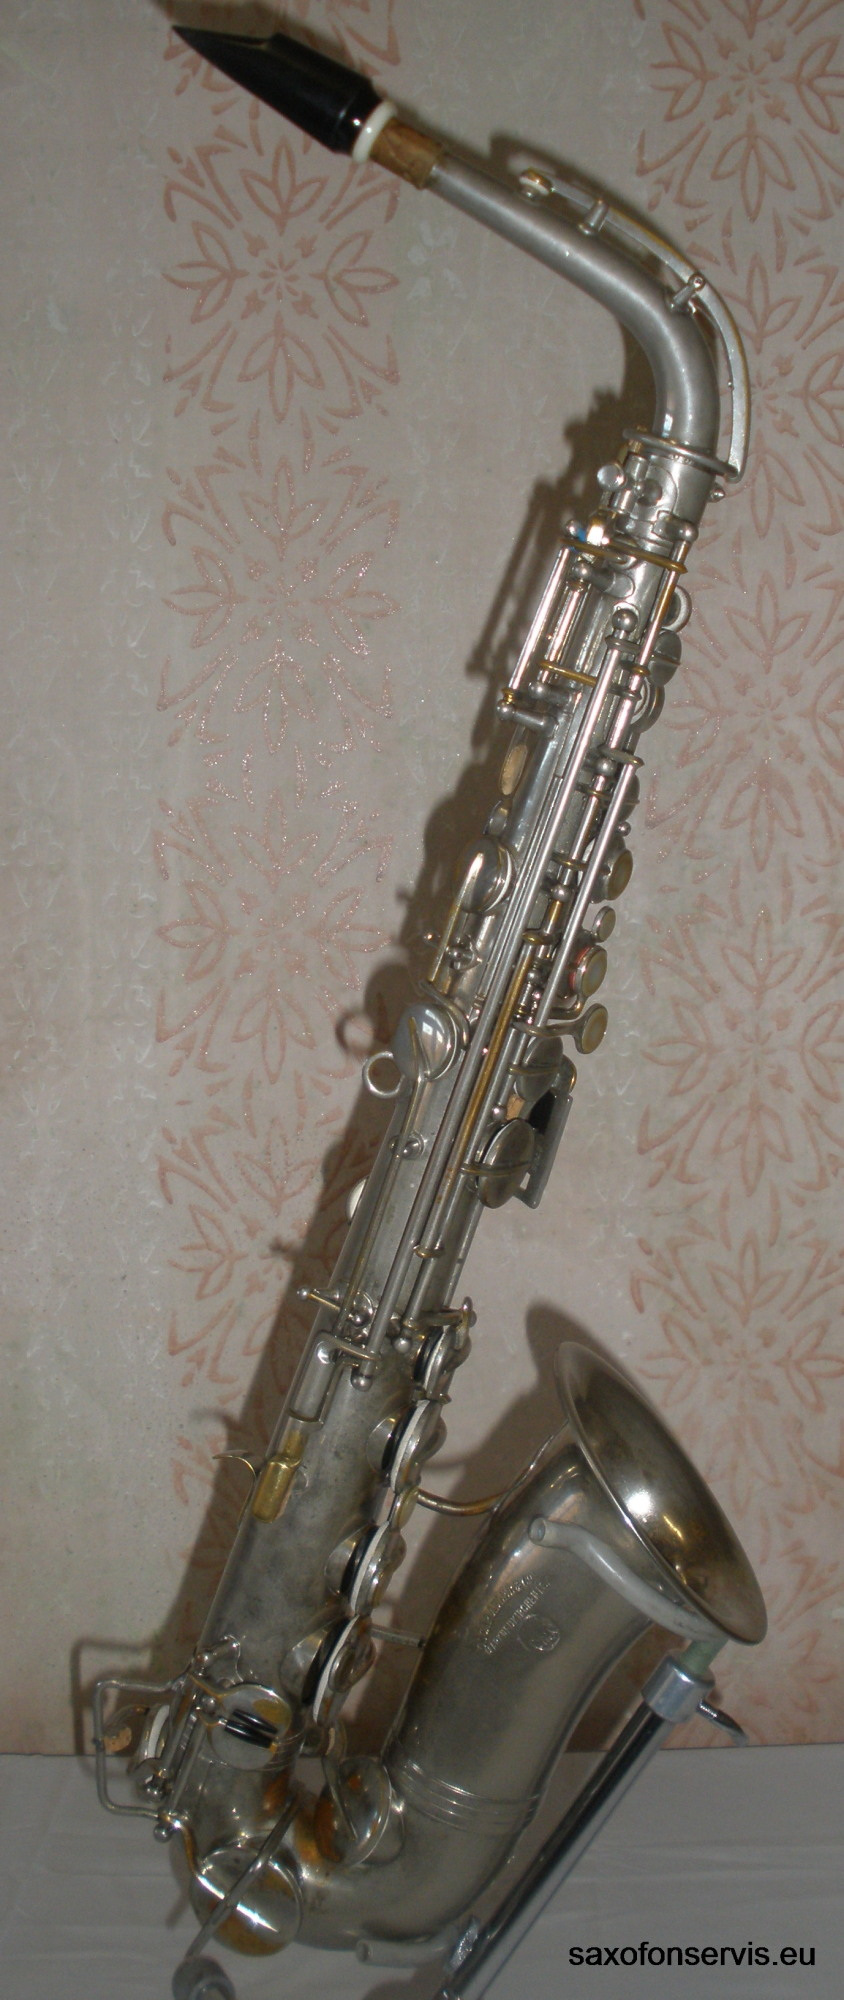 alto saxophone, Oscar Adler saxophone, are vintage instruments practical?